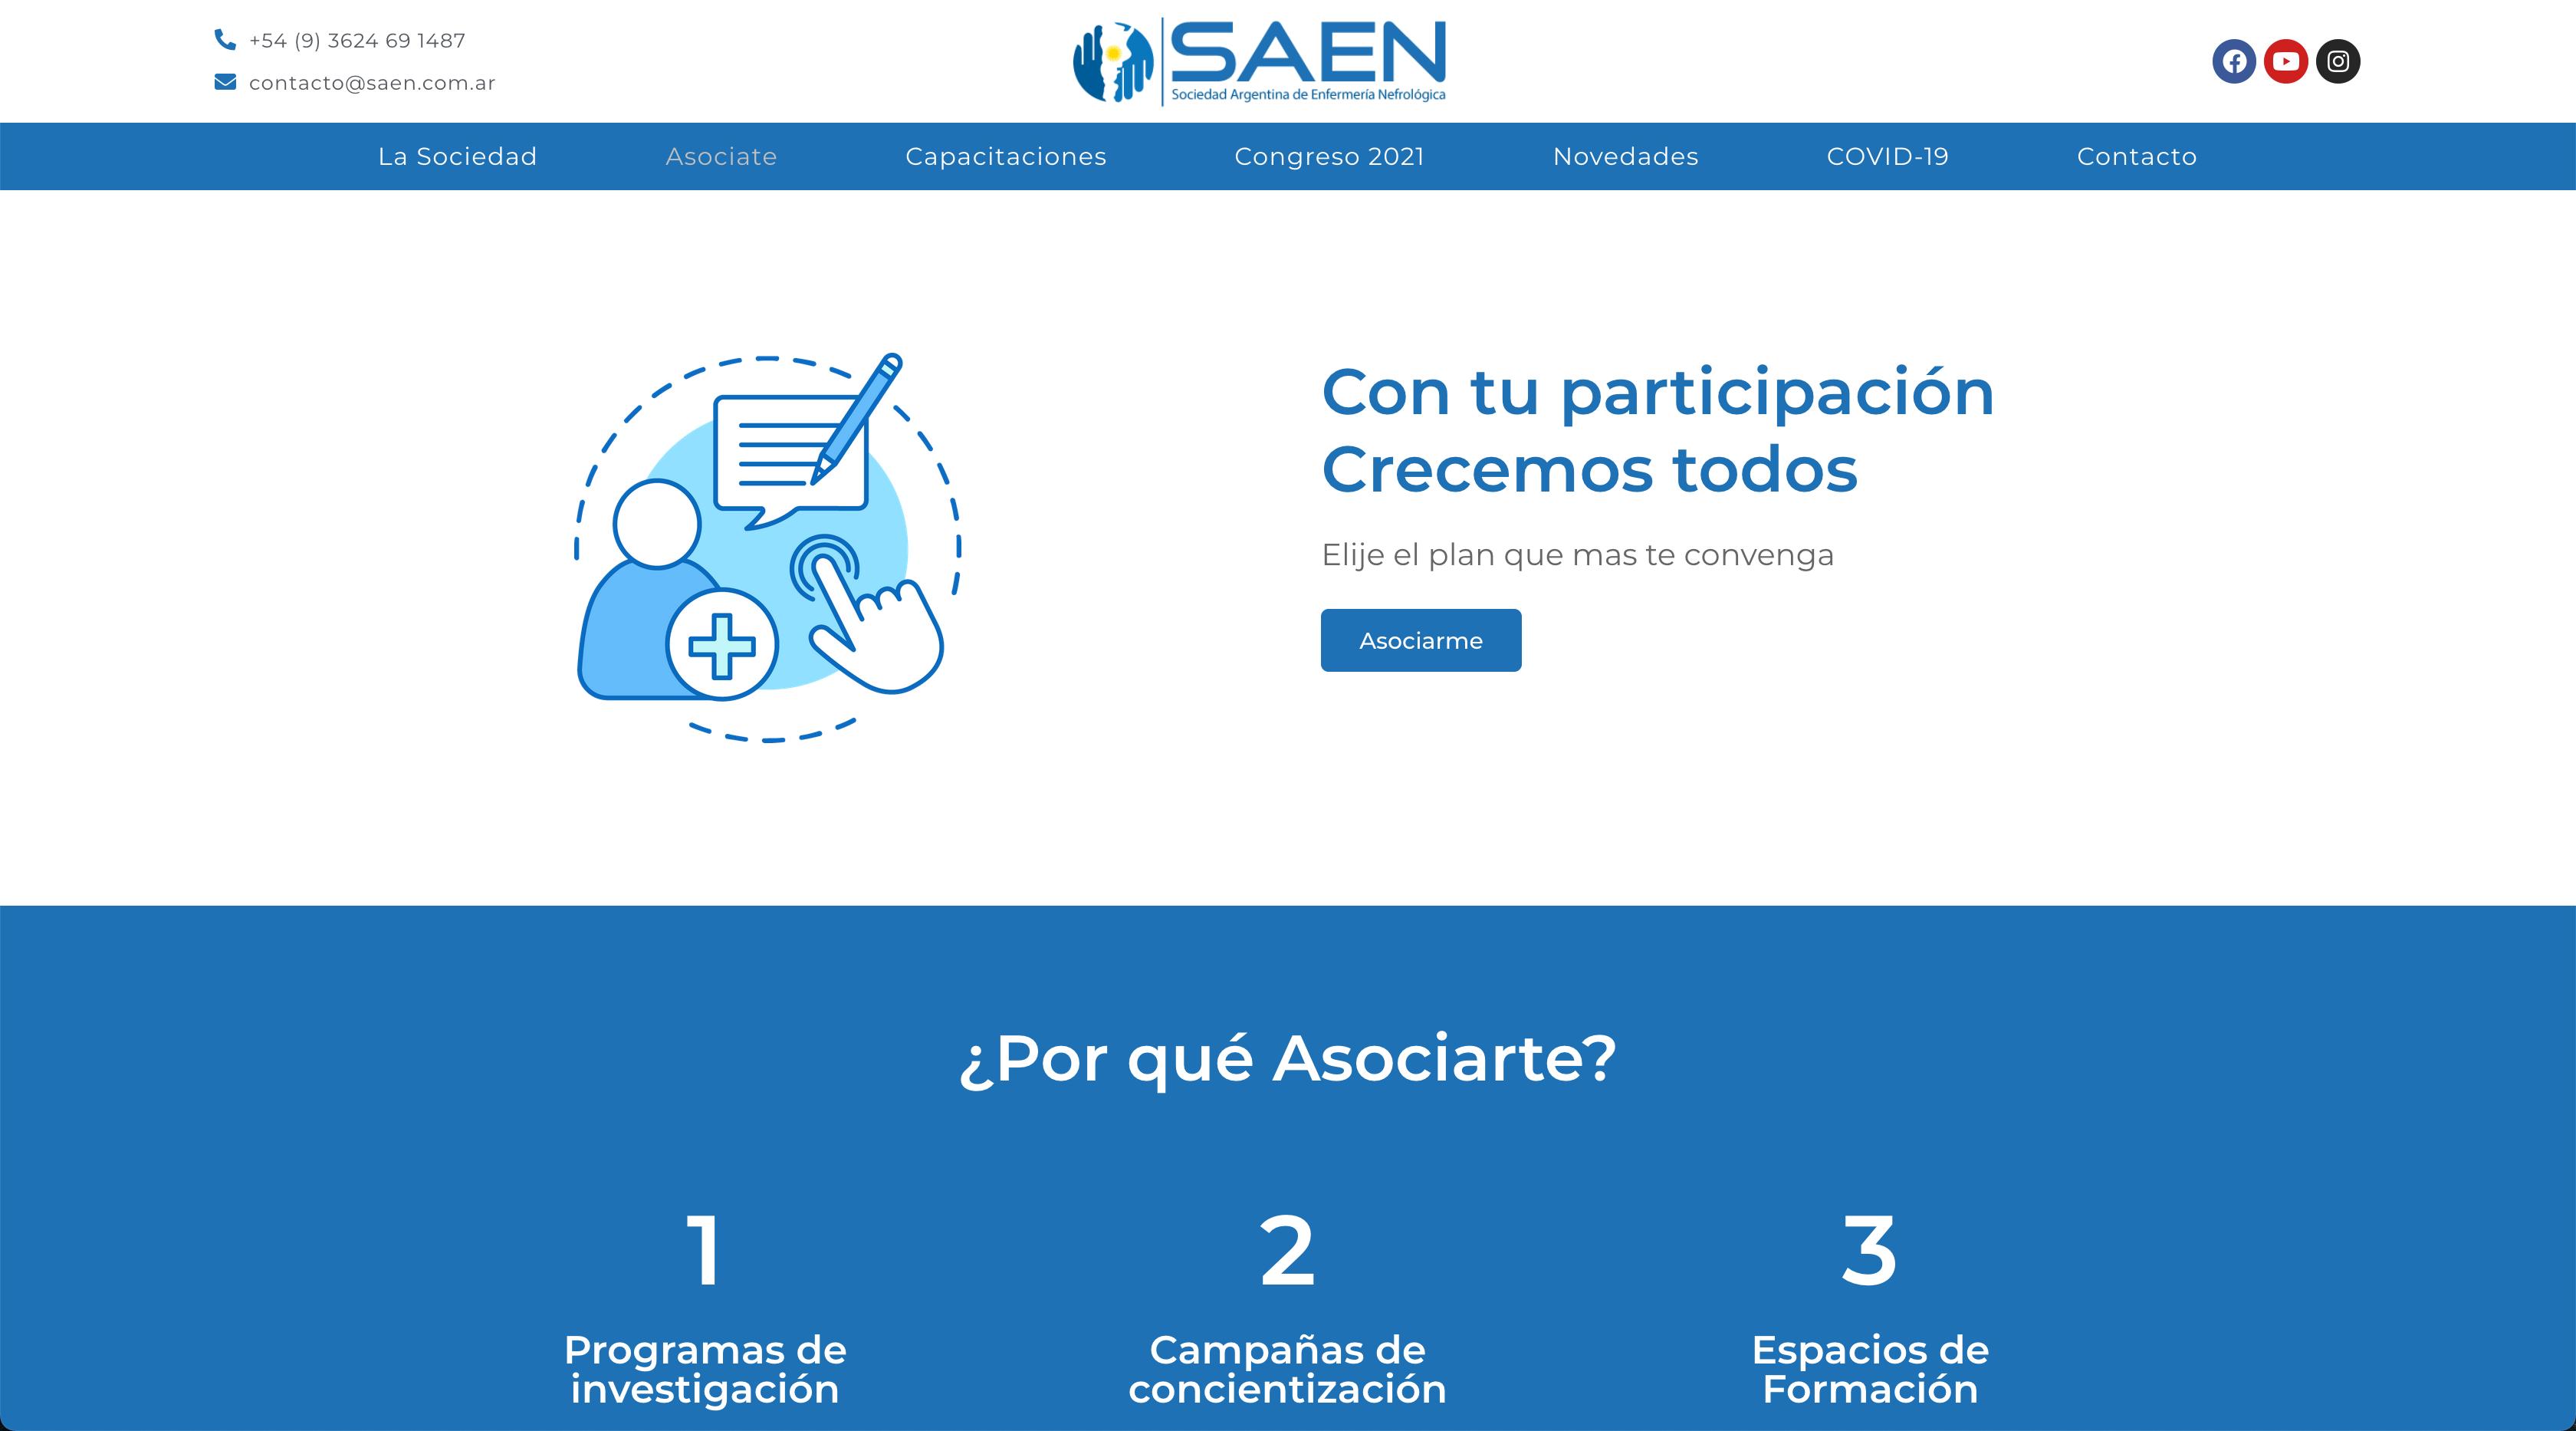 saen-sociedad-argentina-de-enfermeria-nefrologica-online-lab-web-development-web-design-8